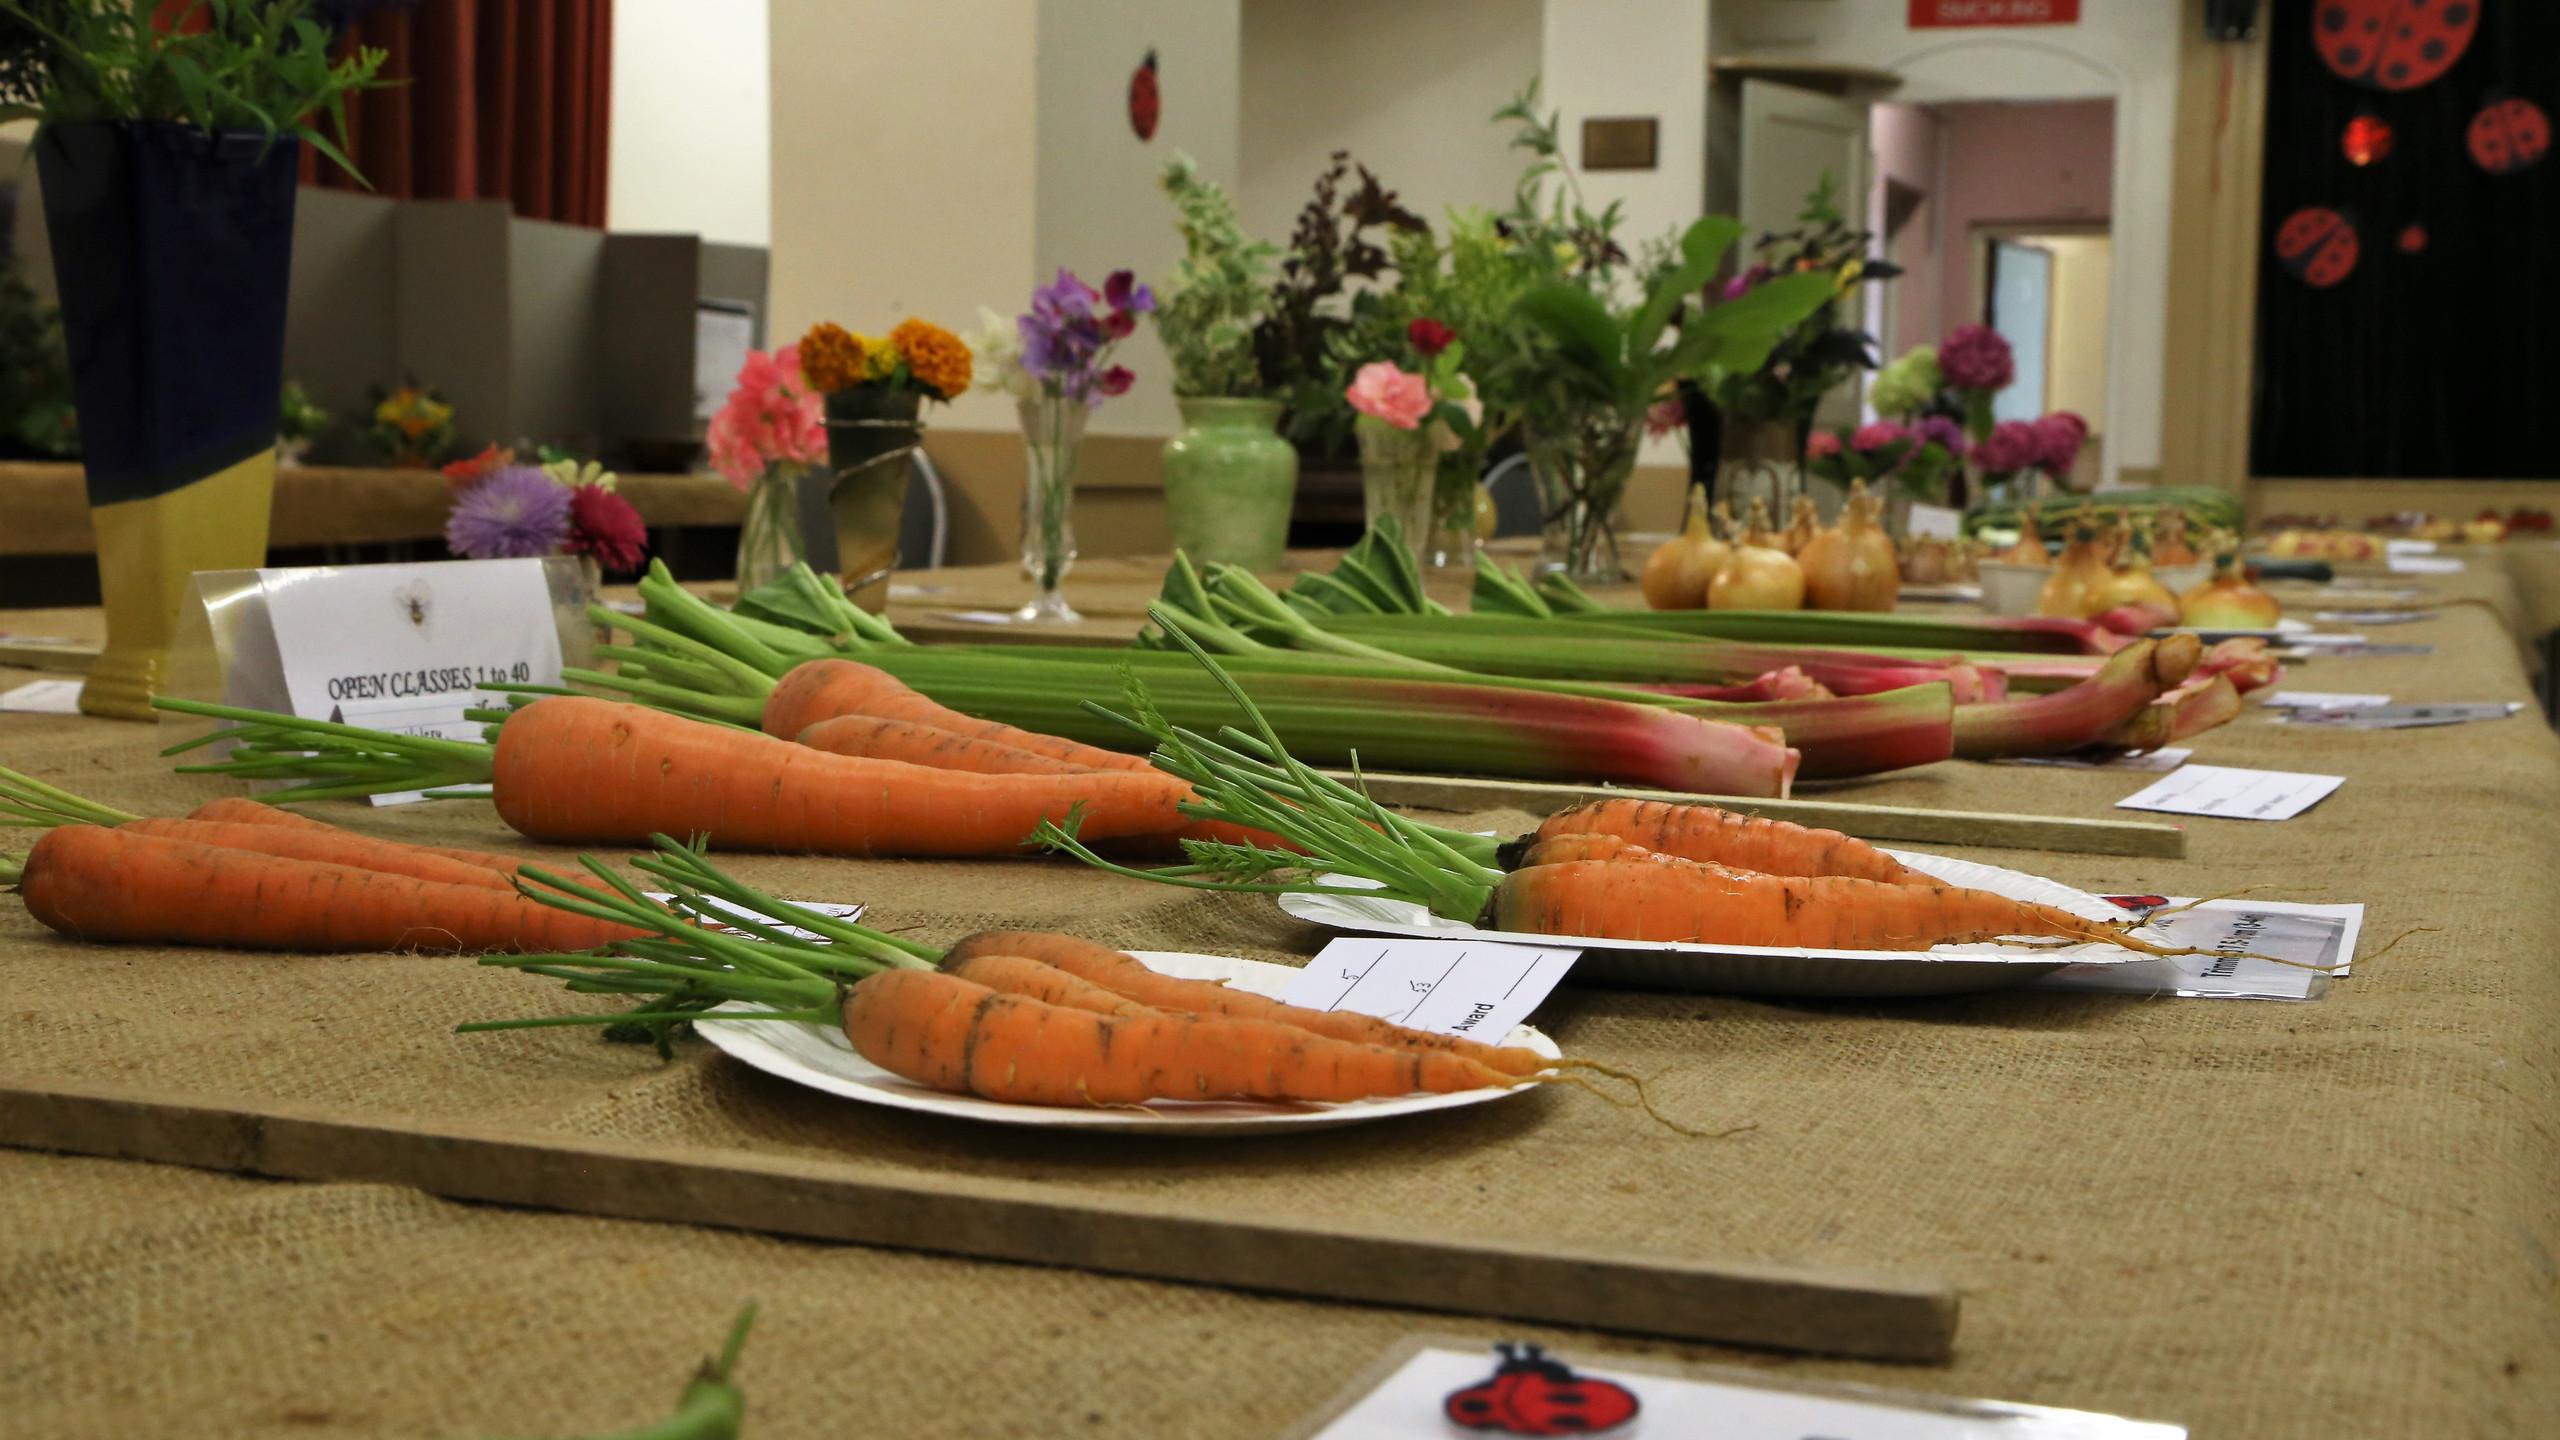 Local carrots